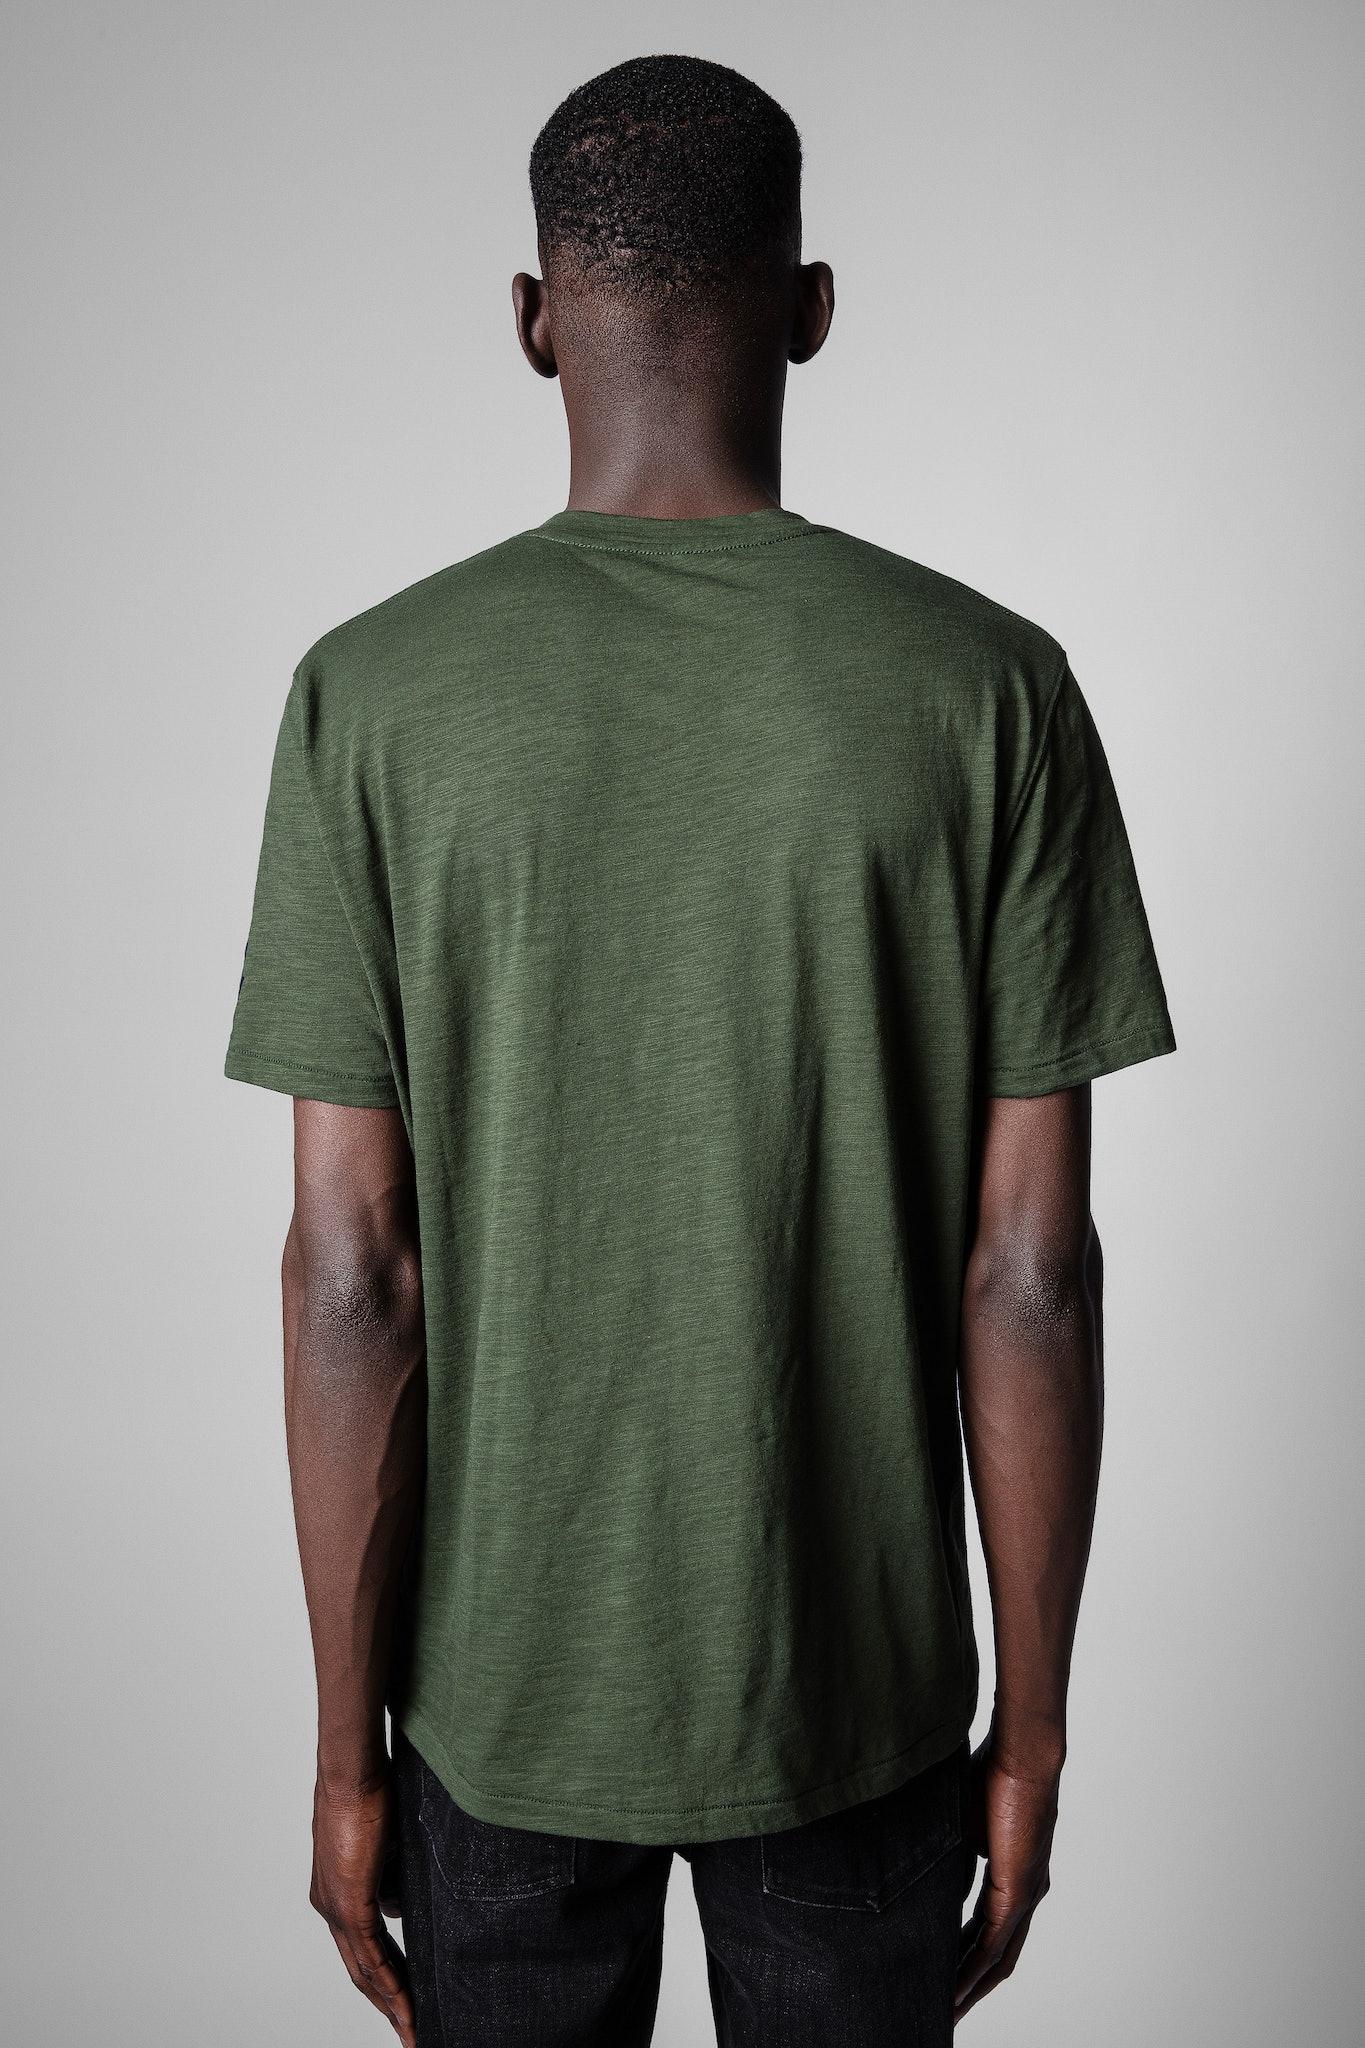 Stocky T-shirt